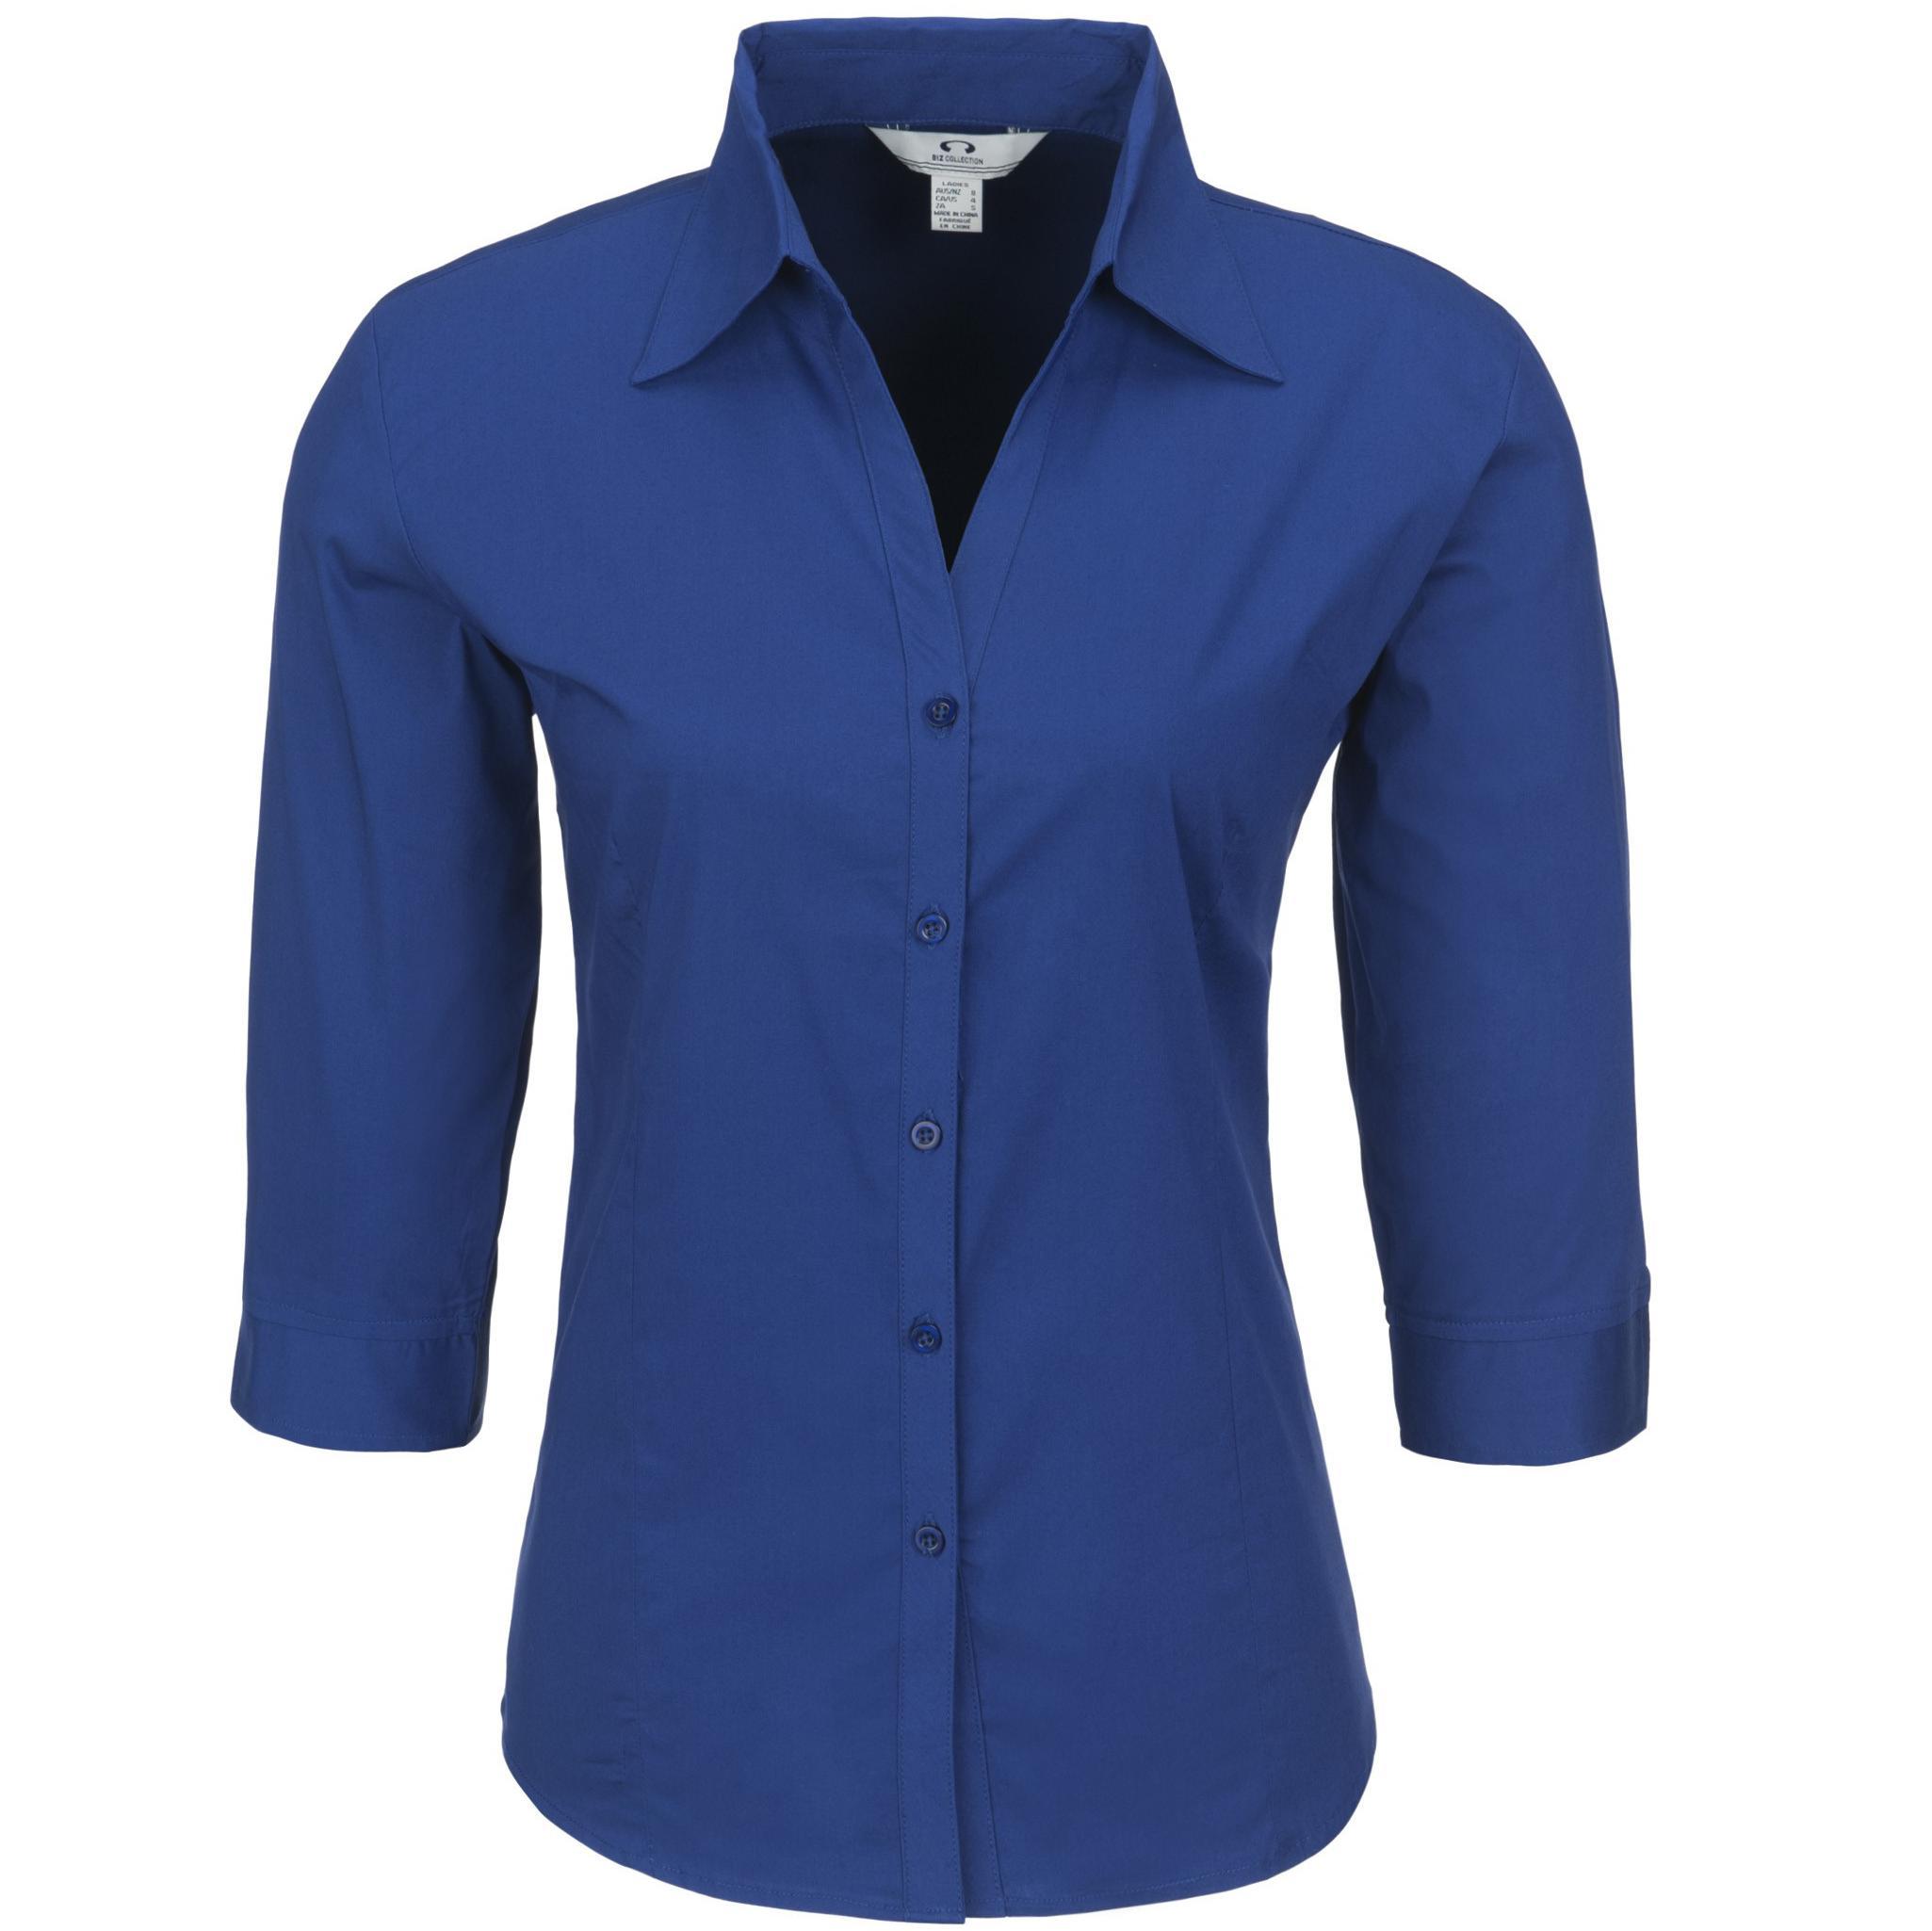 Ladies 3/4 Sleeve Metro Shirt - Royal Blue Only